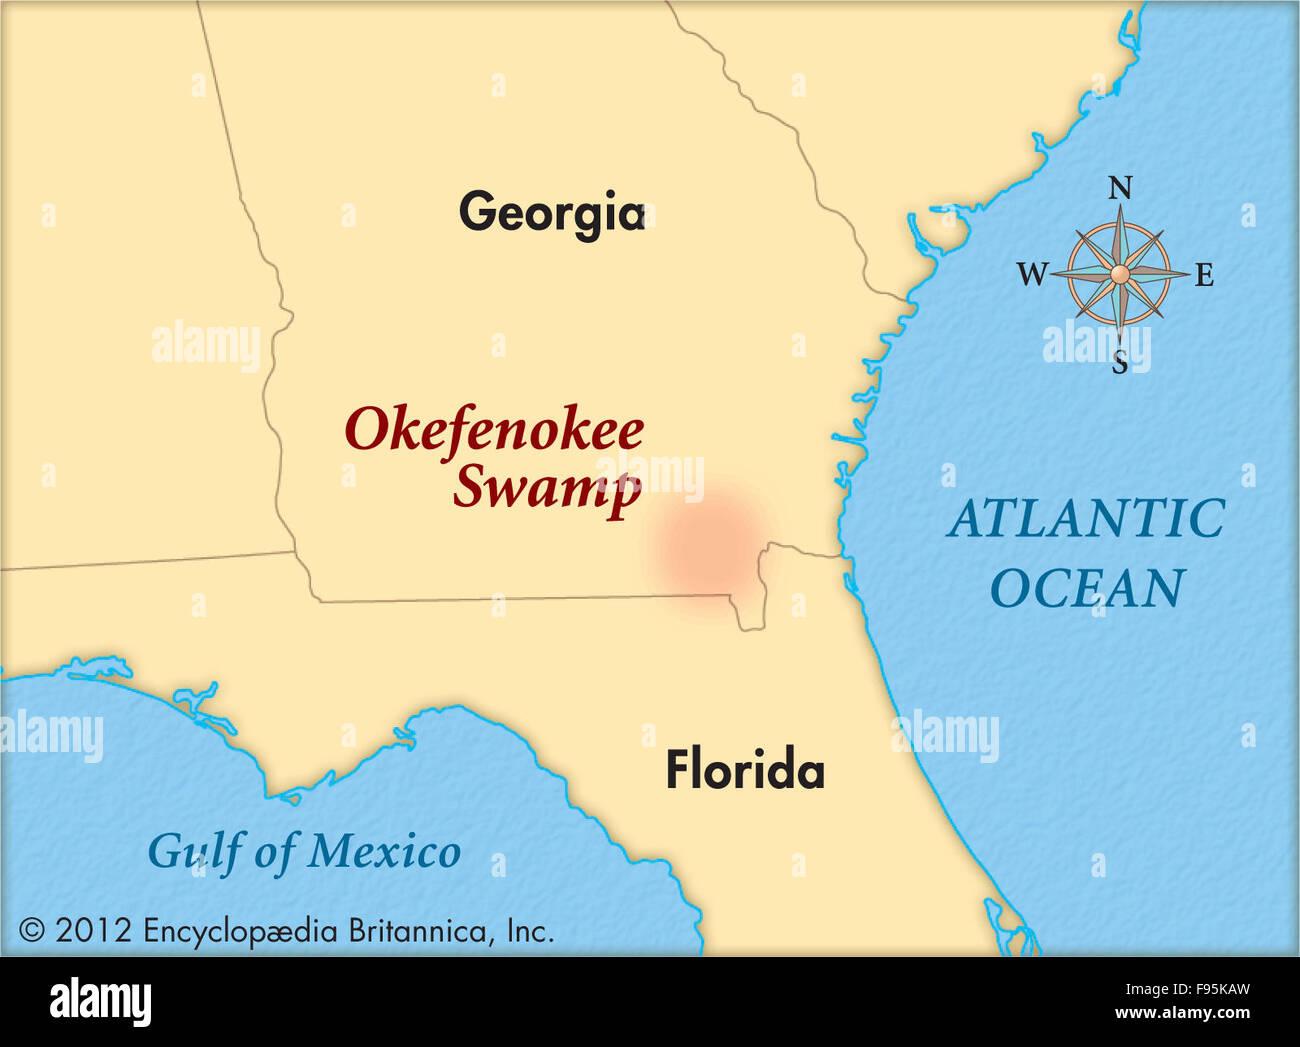 Okefenokee Fire Map.Okefenokee Swamp Stock Photo 91708705 Alamy